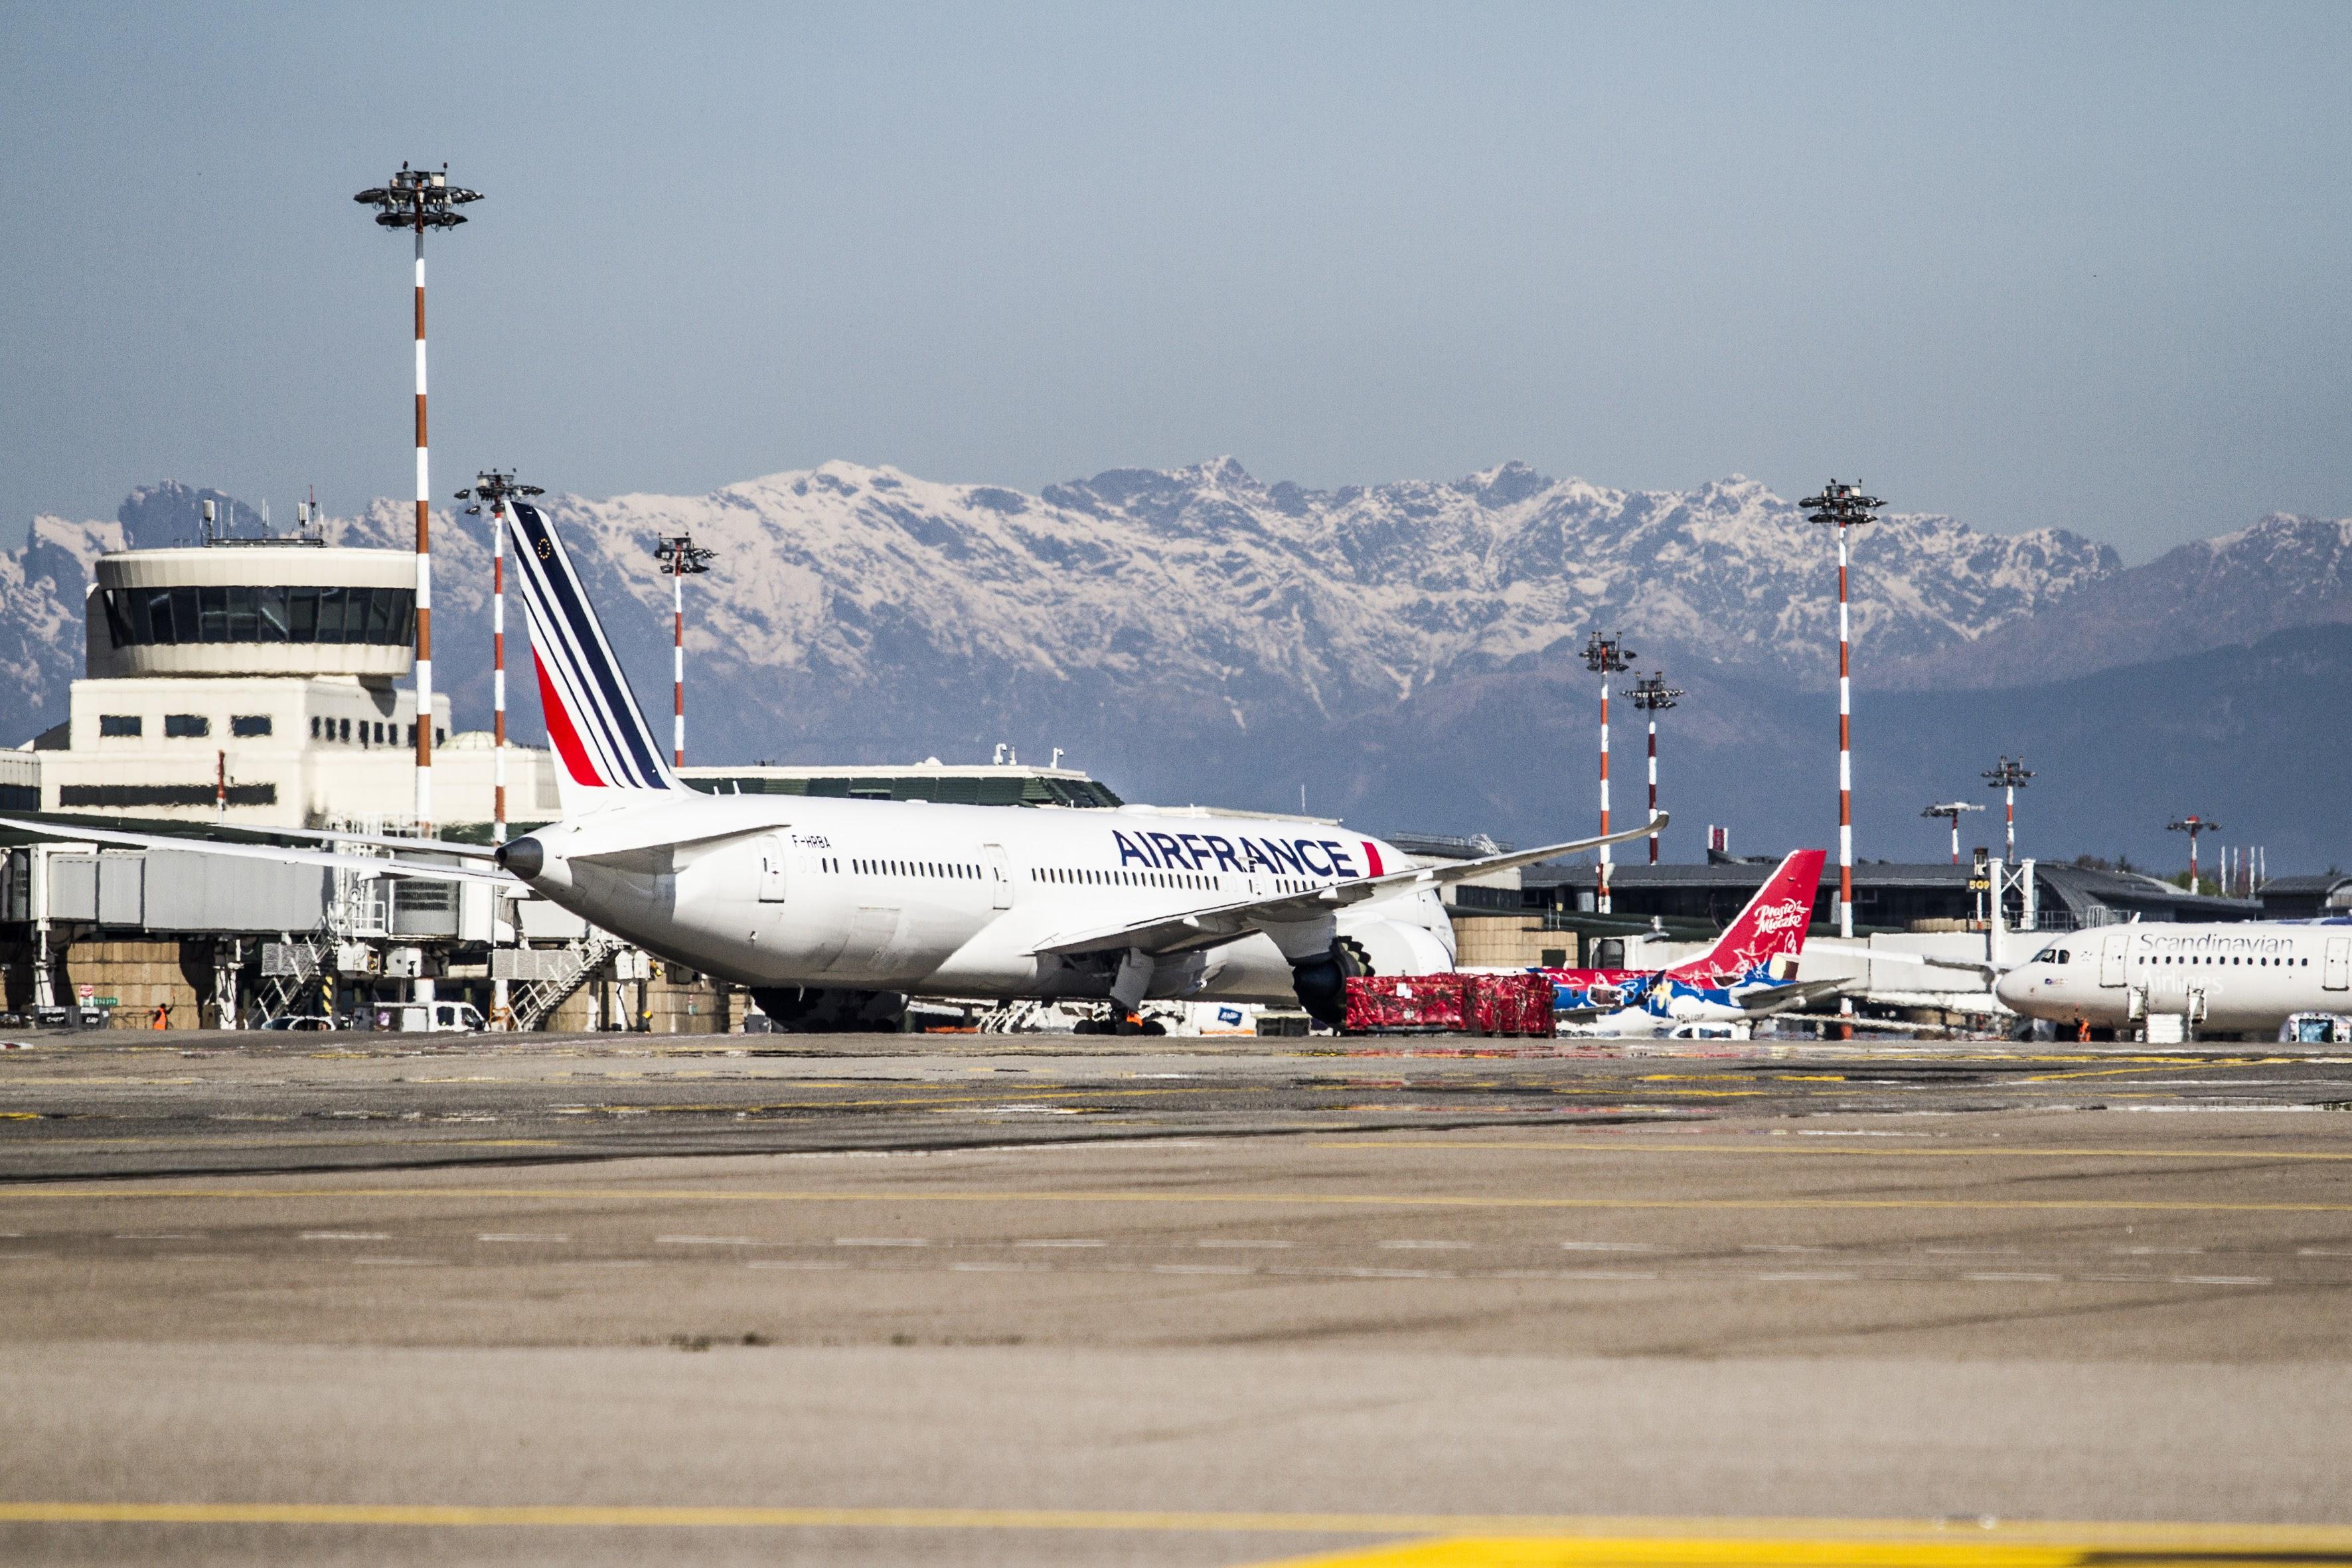 Nuovi voli Air France per Parigi da Milano Malpensa